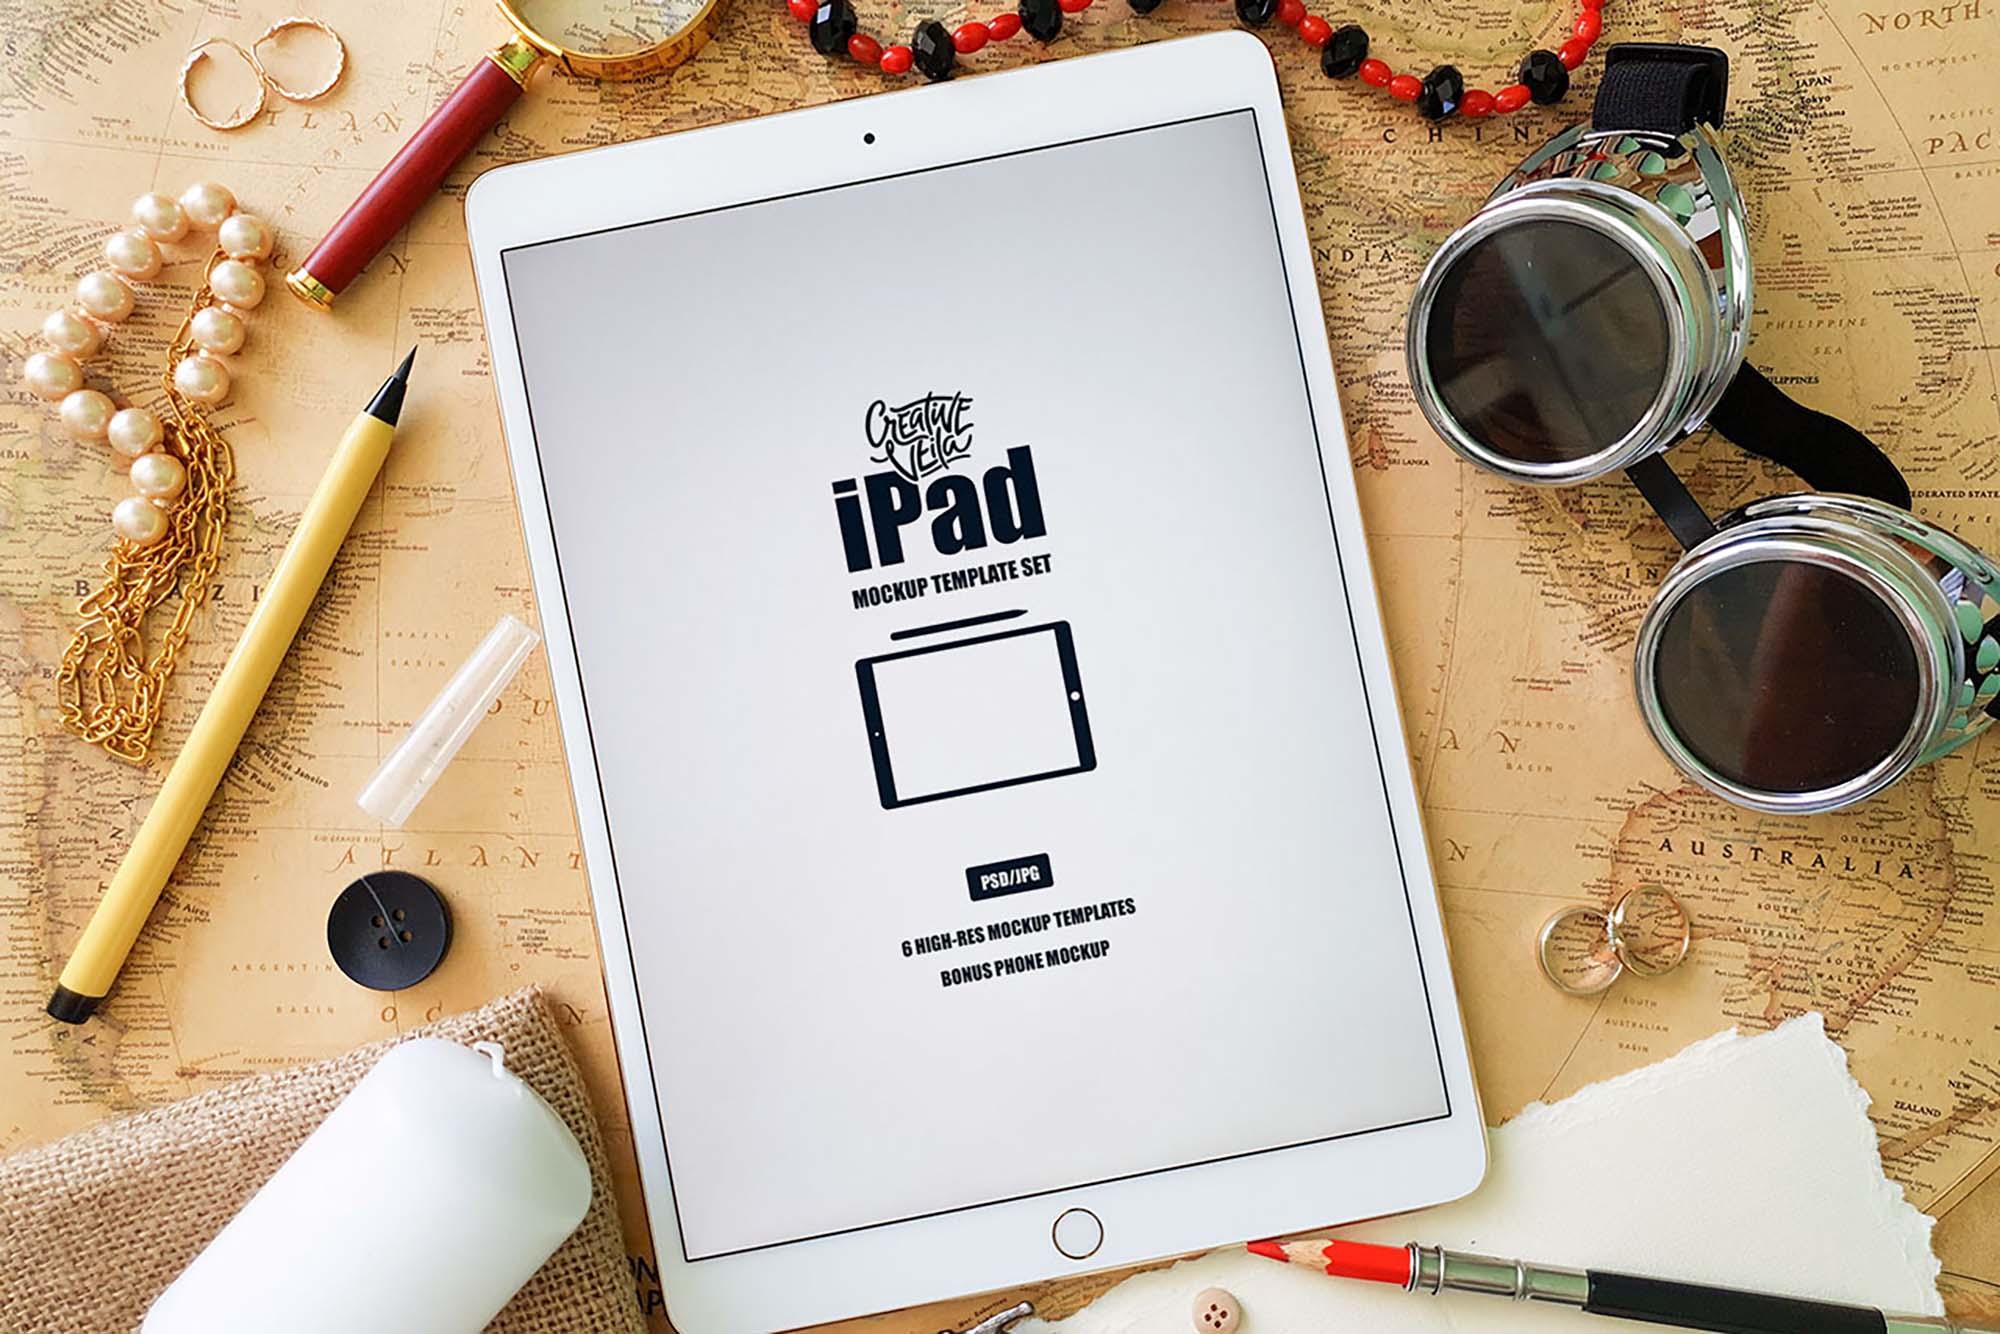 iPad Mockup Template 6